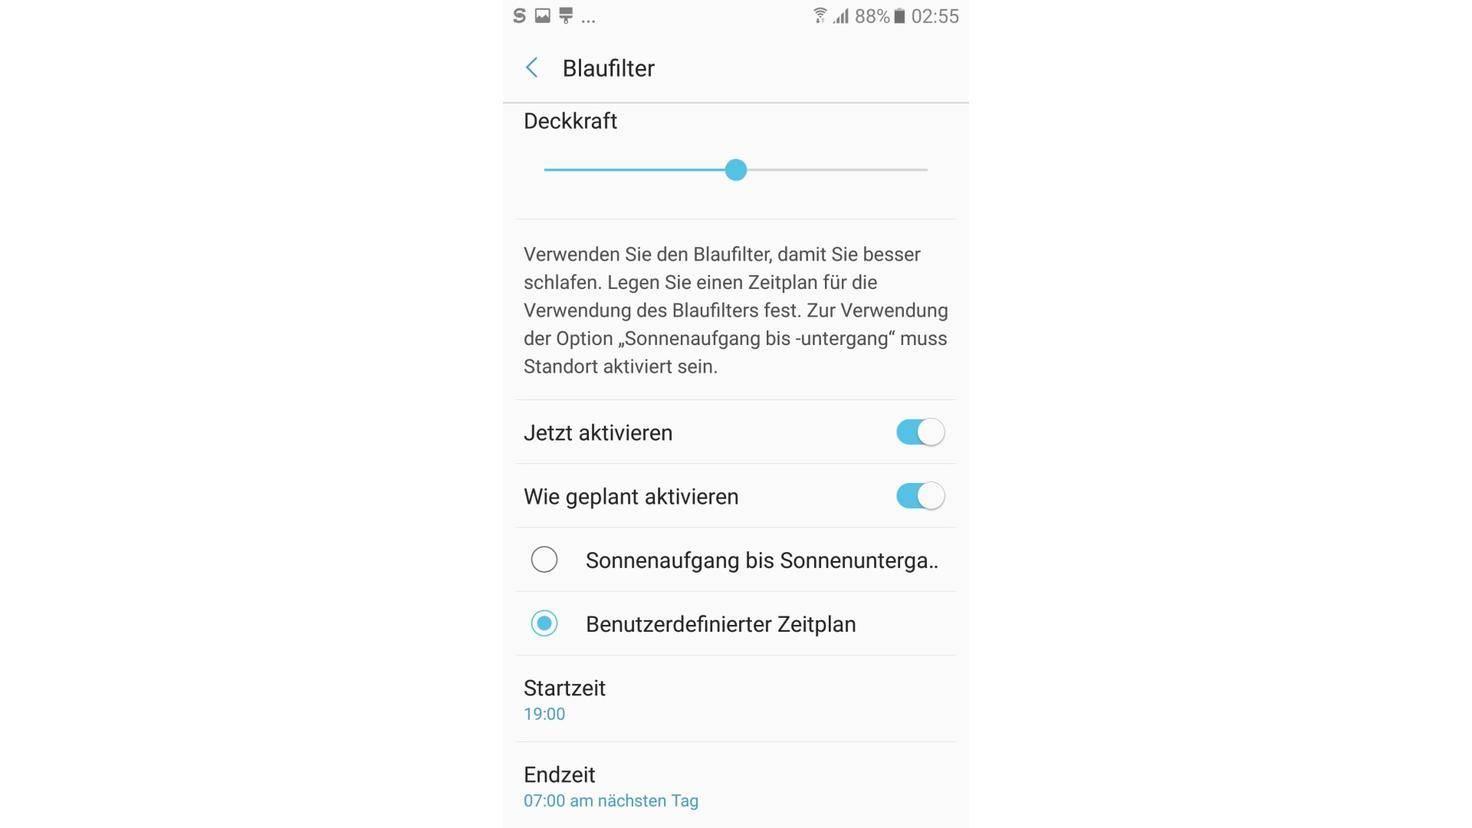 Blaufilter Galaxy A5 2017